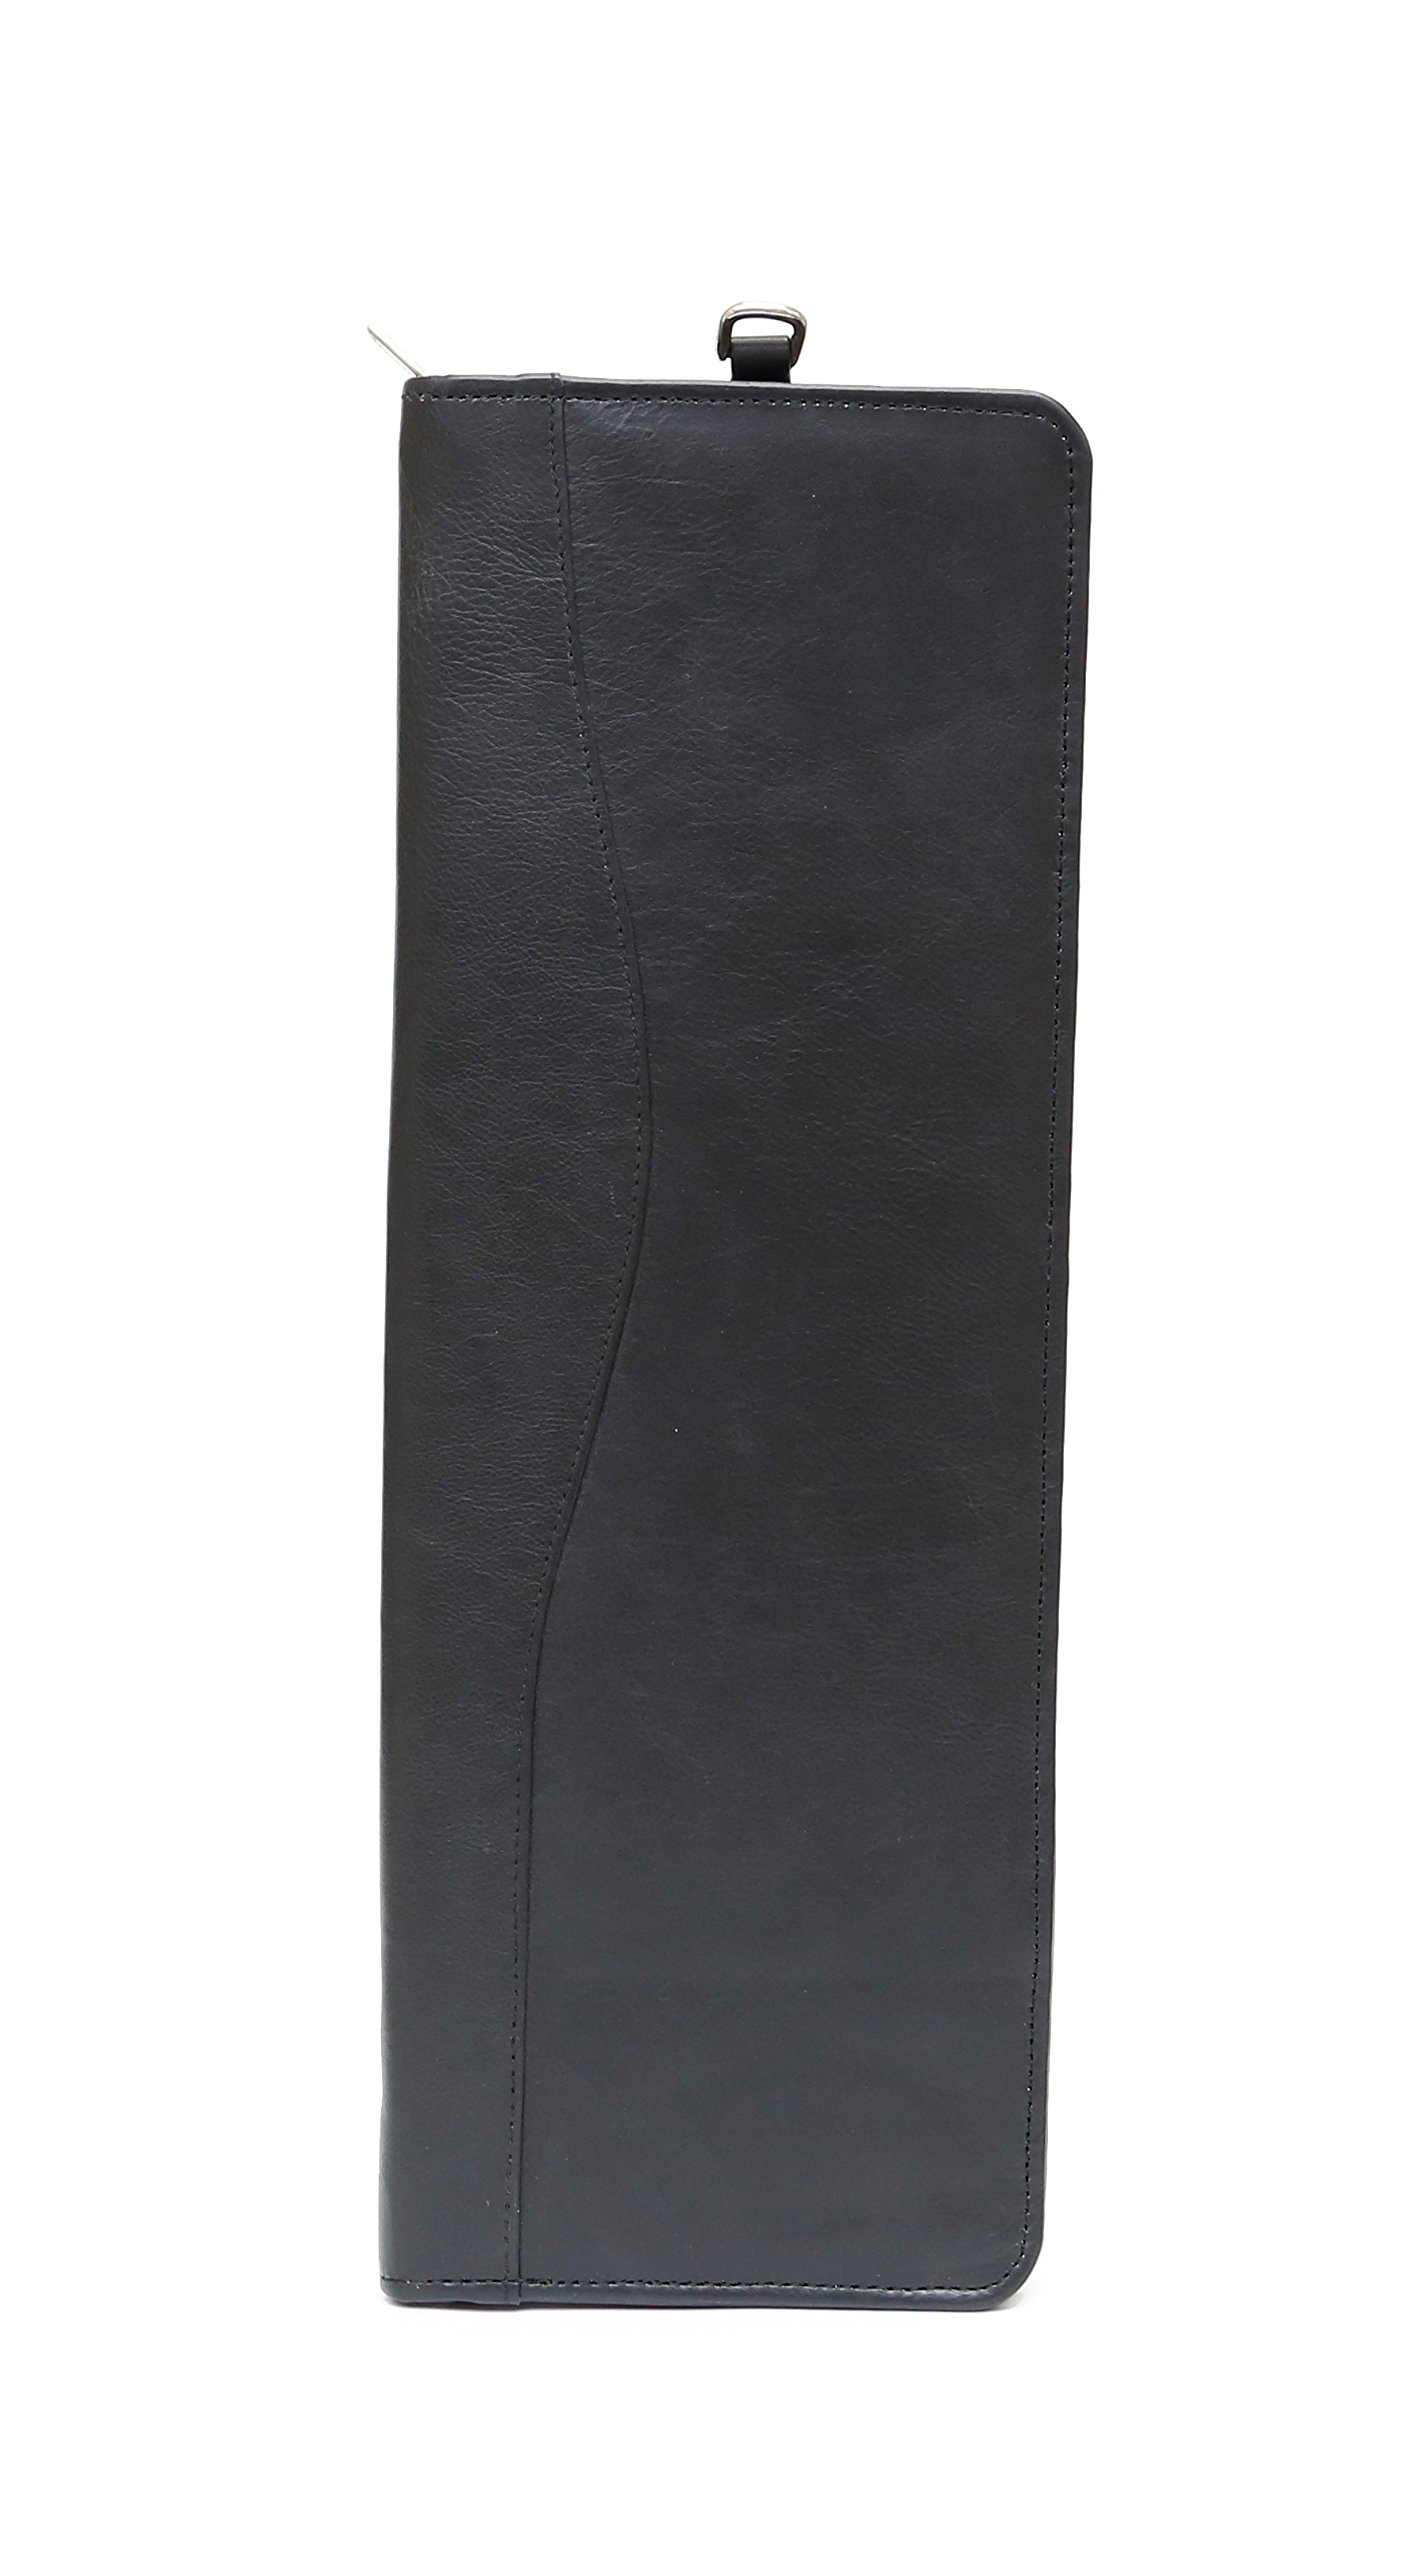 Ashlin 100% Tuscany Leather Zippered Tie Case (TIE01-18-01)